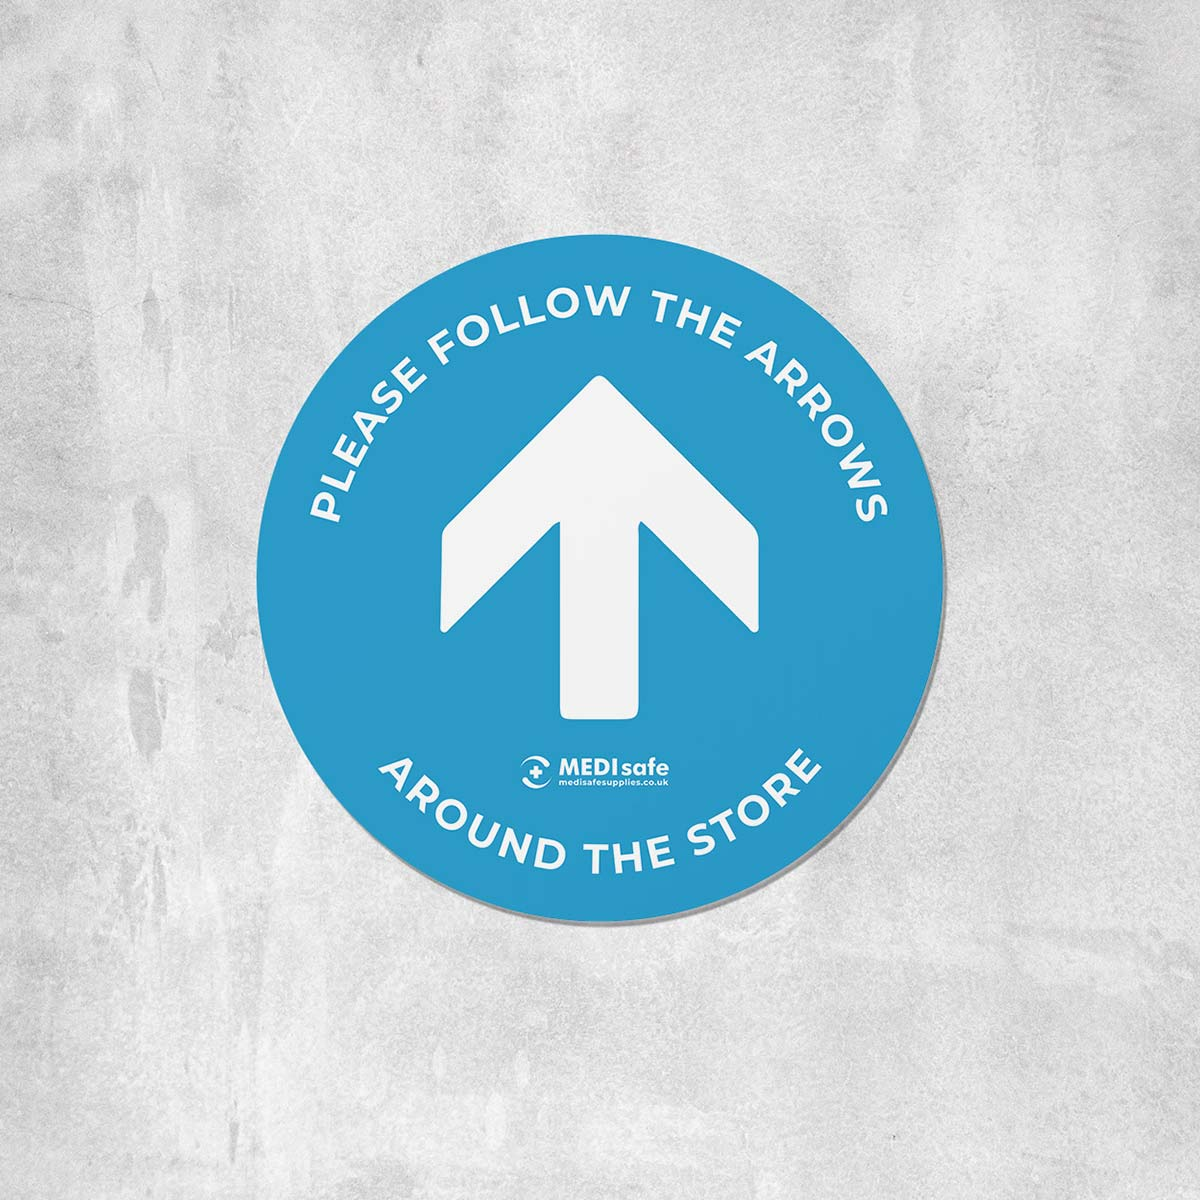 Please Follow The Arrows Floor Stickers (Circular) | Social Distancing blue